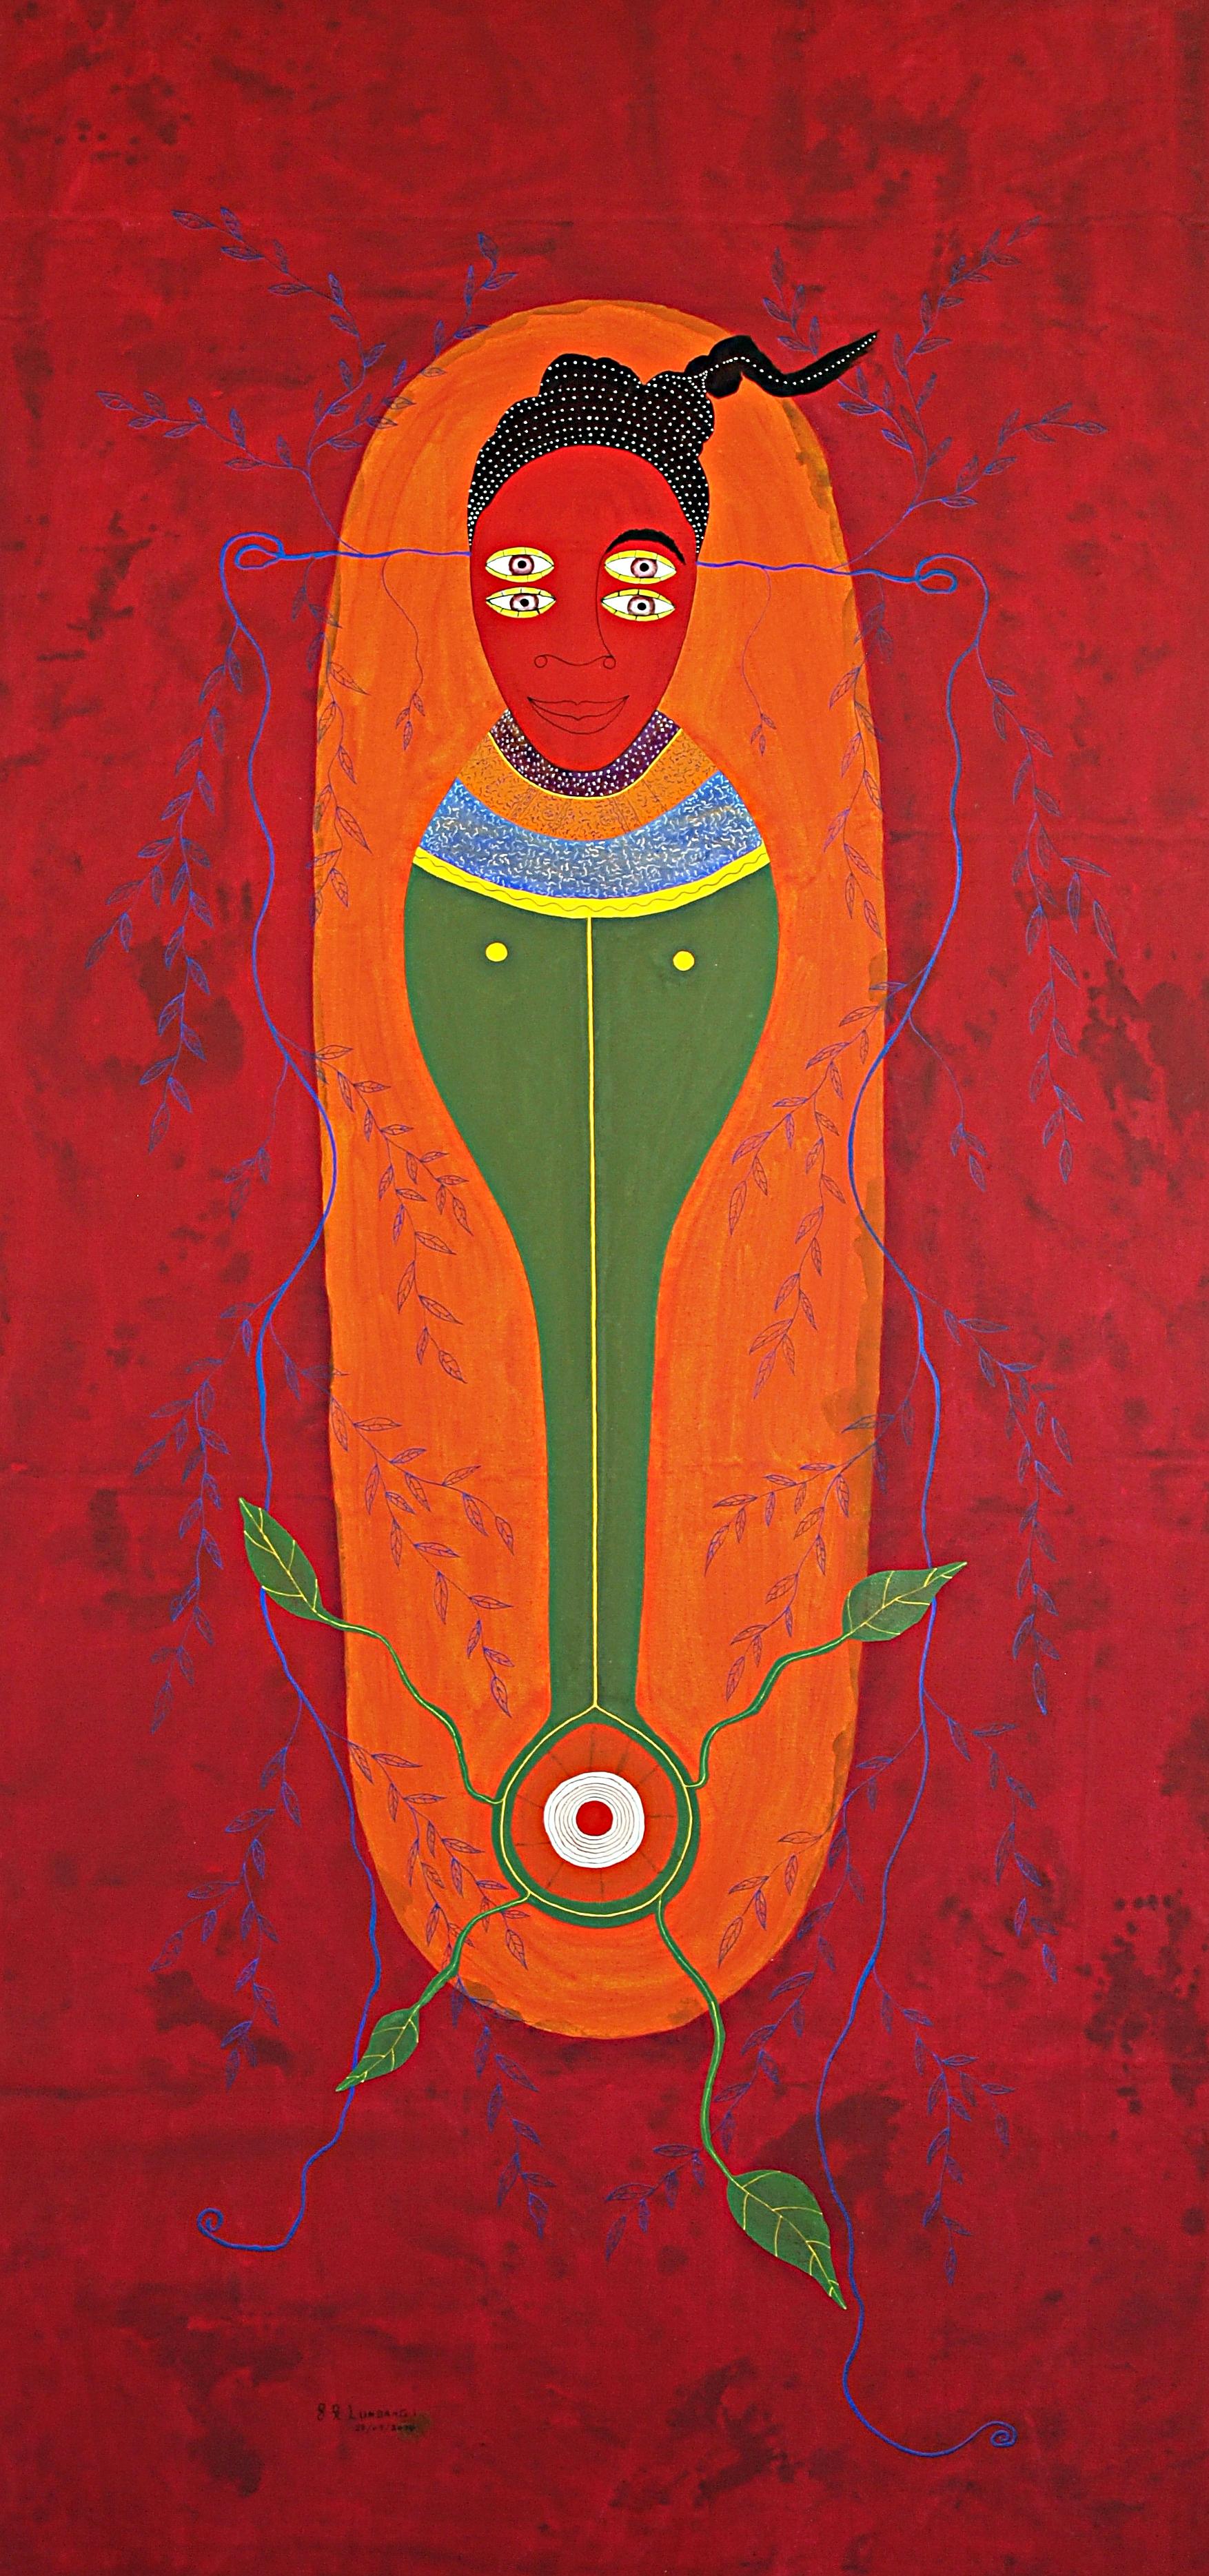 Franck K. Lundangi    Untitled  , 2014 Acrylic pigment and ink on canvas 92.5 x 43.5 inches 235 x 110.5 cm FLu 32